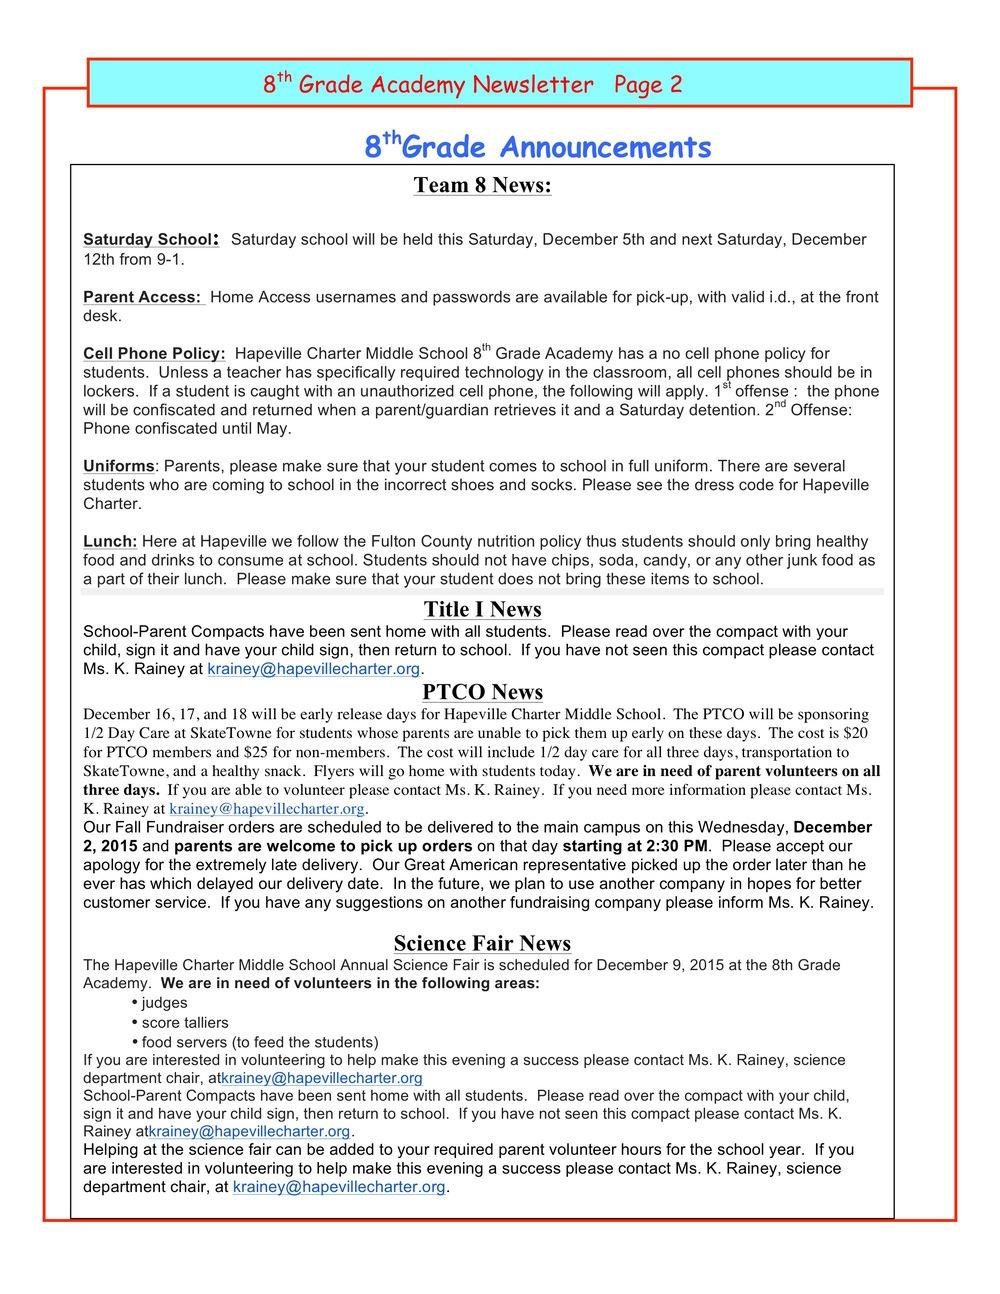 Newsletter Image8th grade December 1 2015 2.jpeg